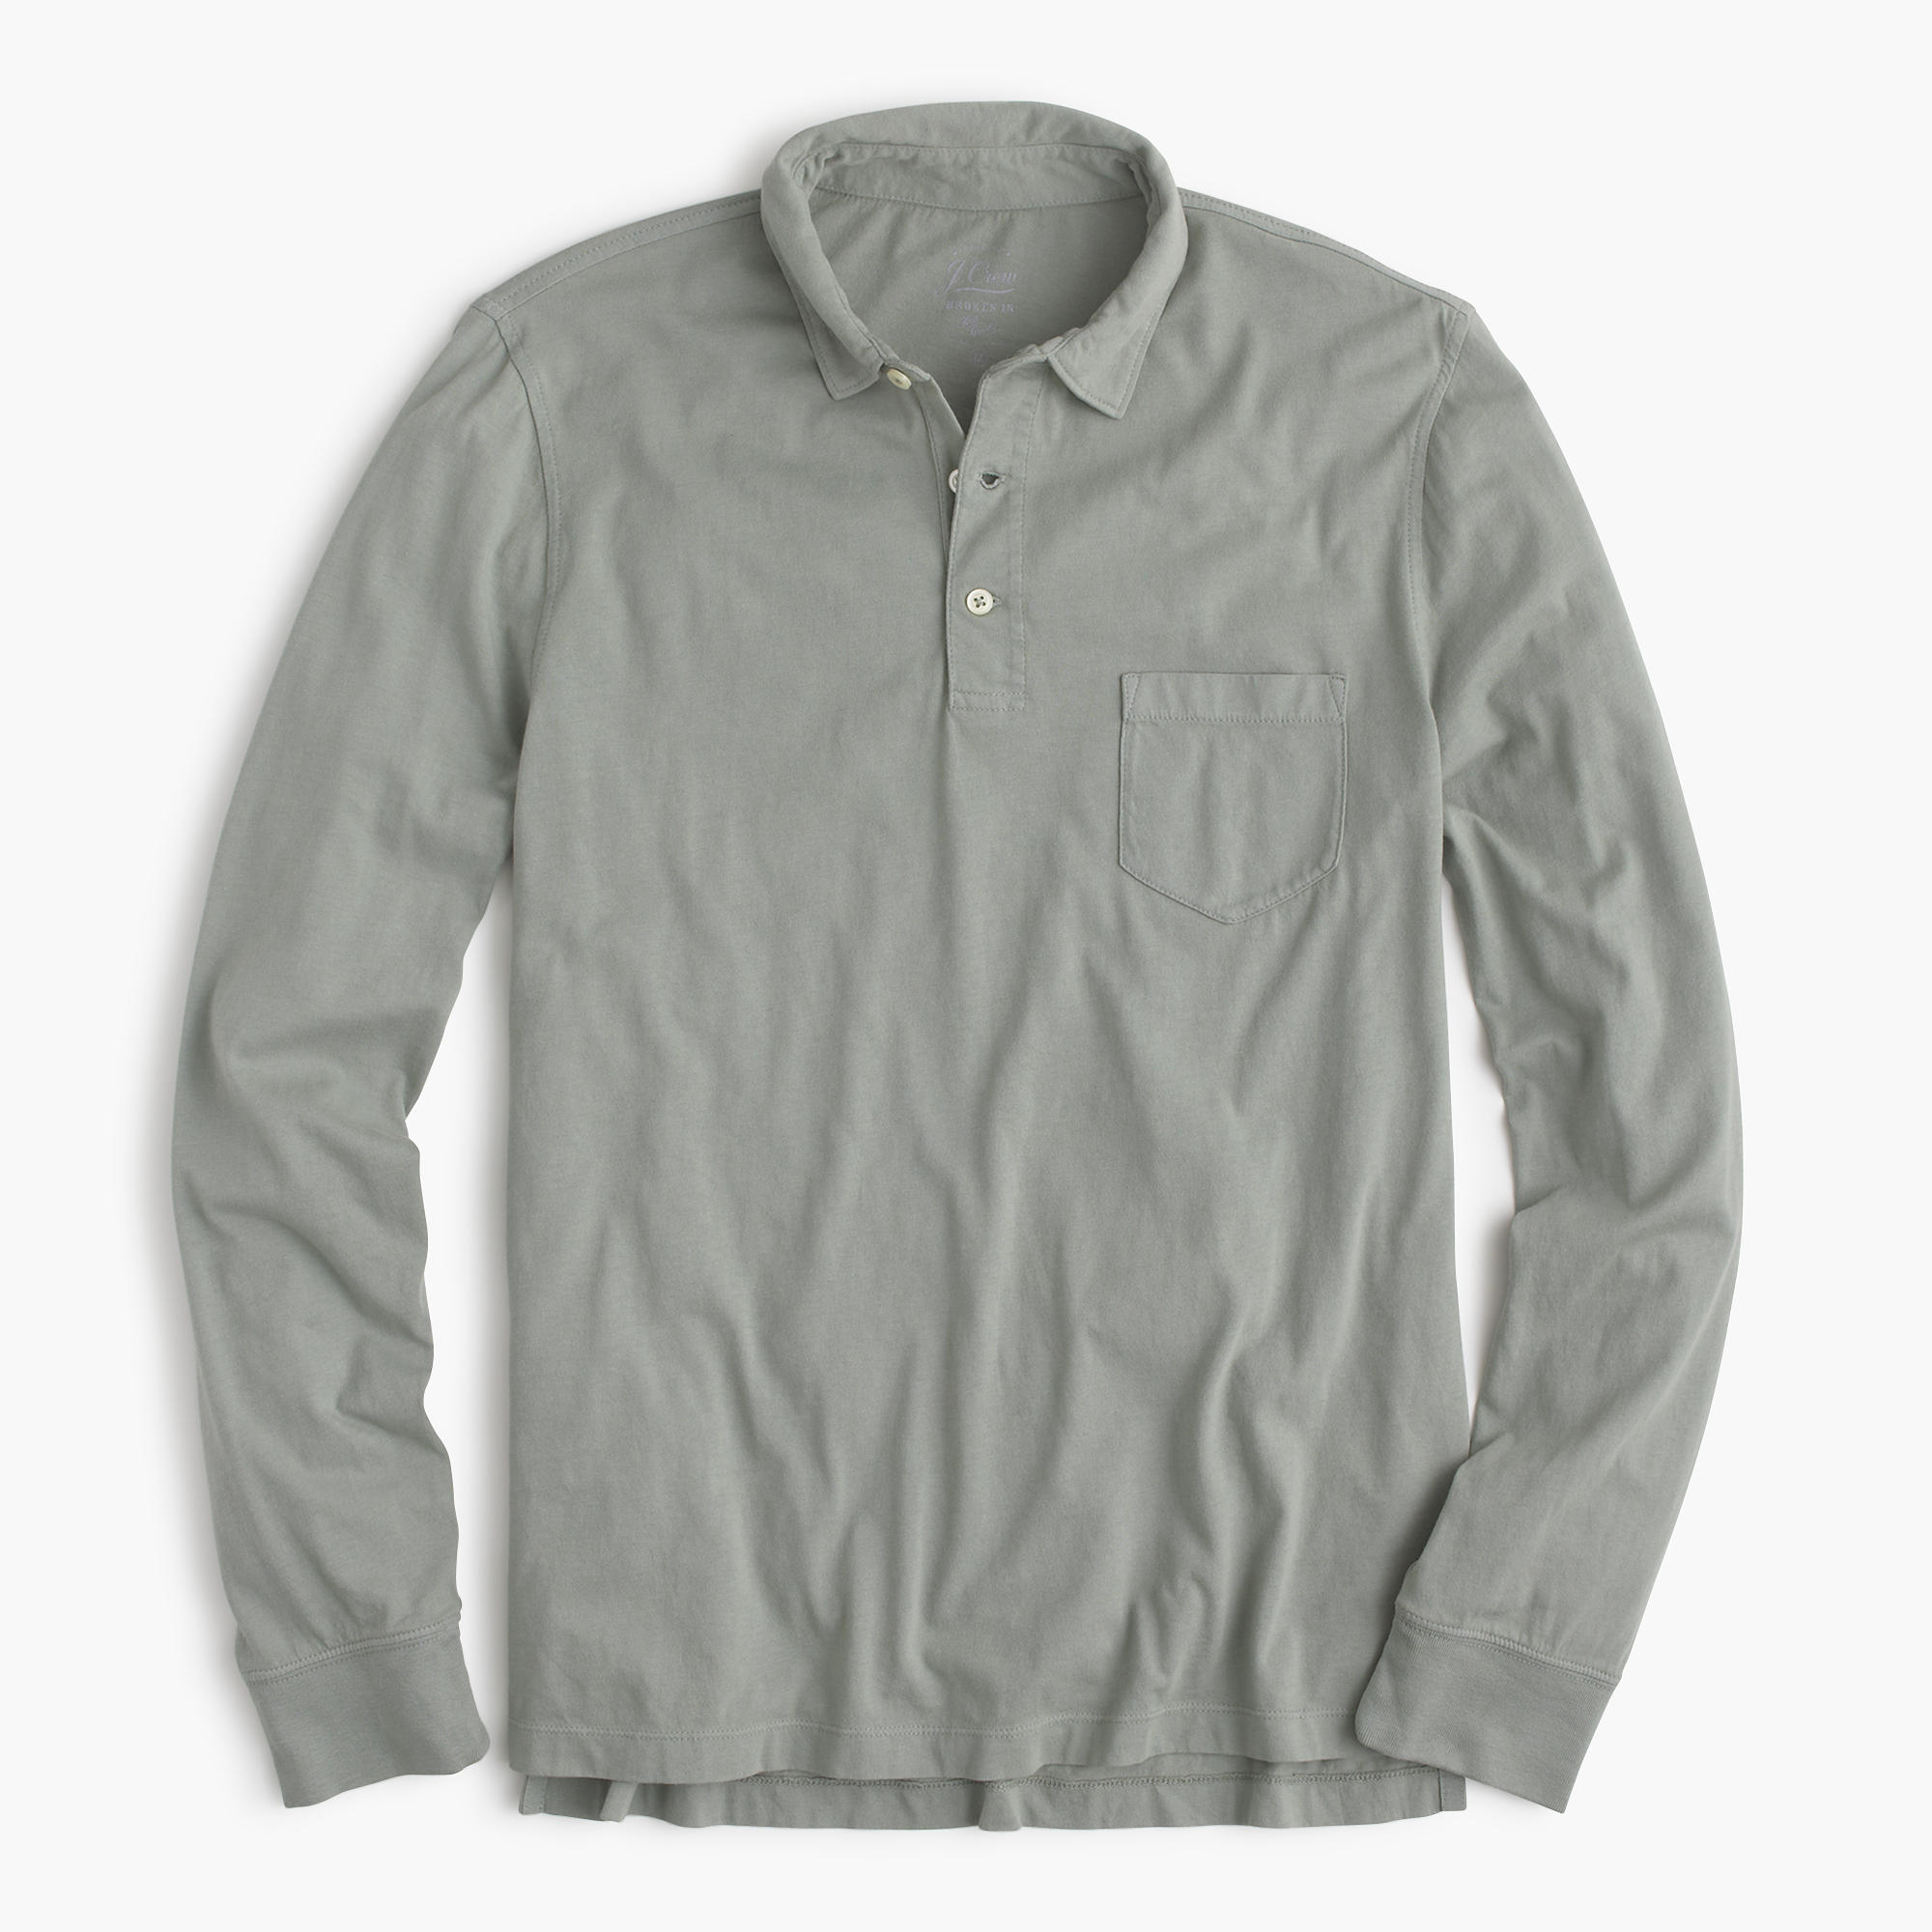 Jersey Long-Sleeve